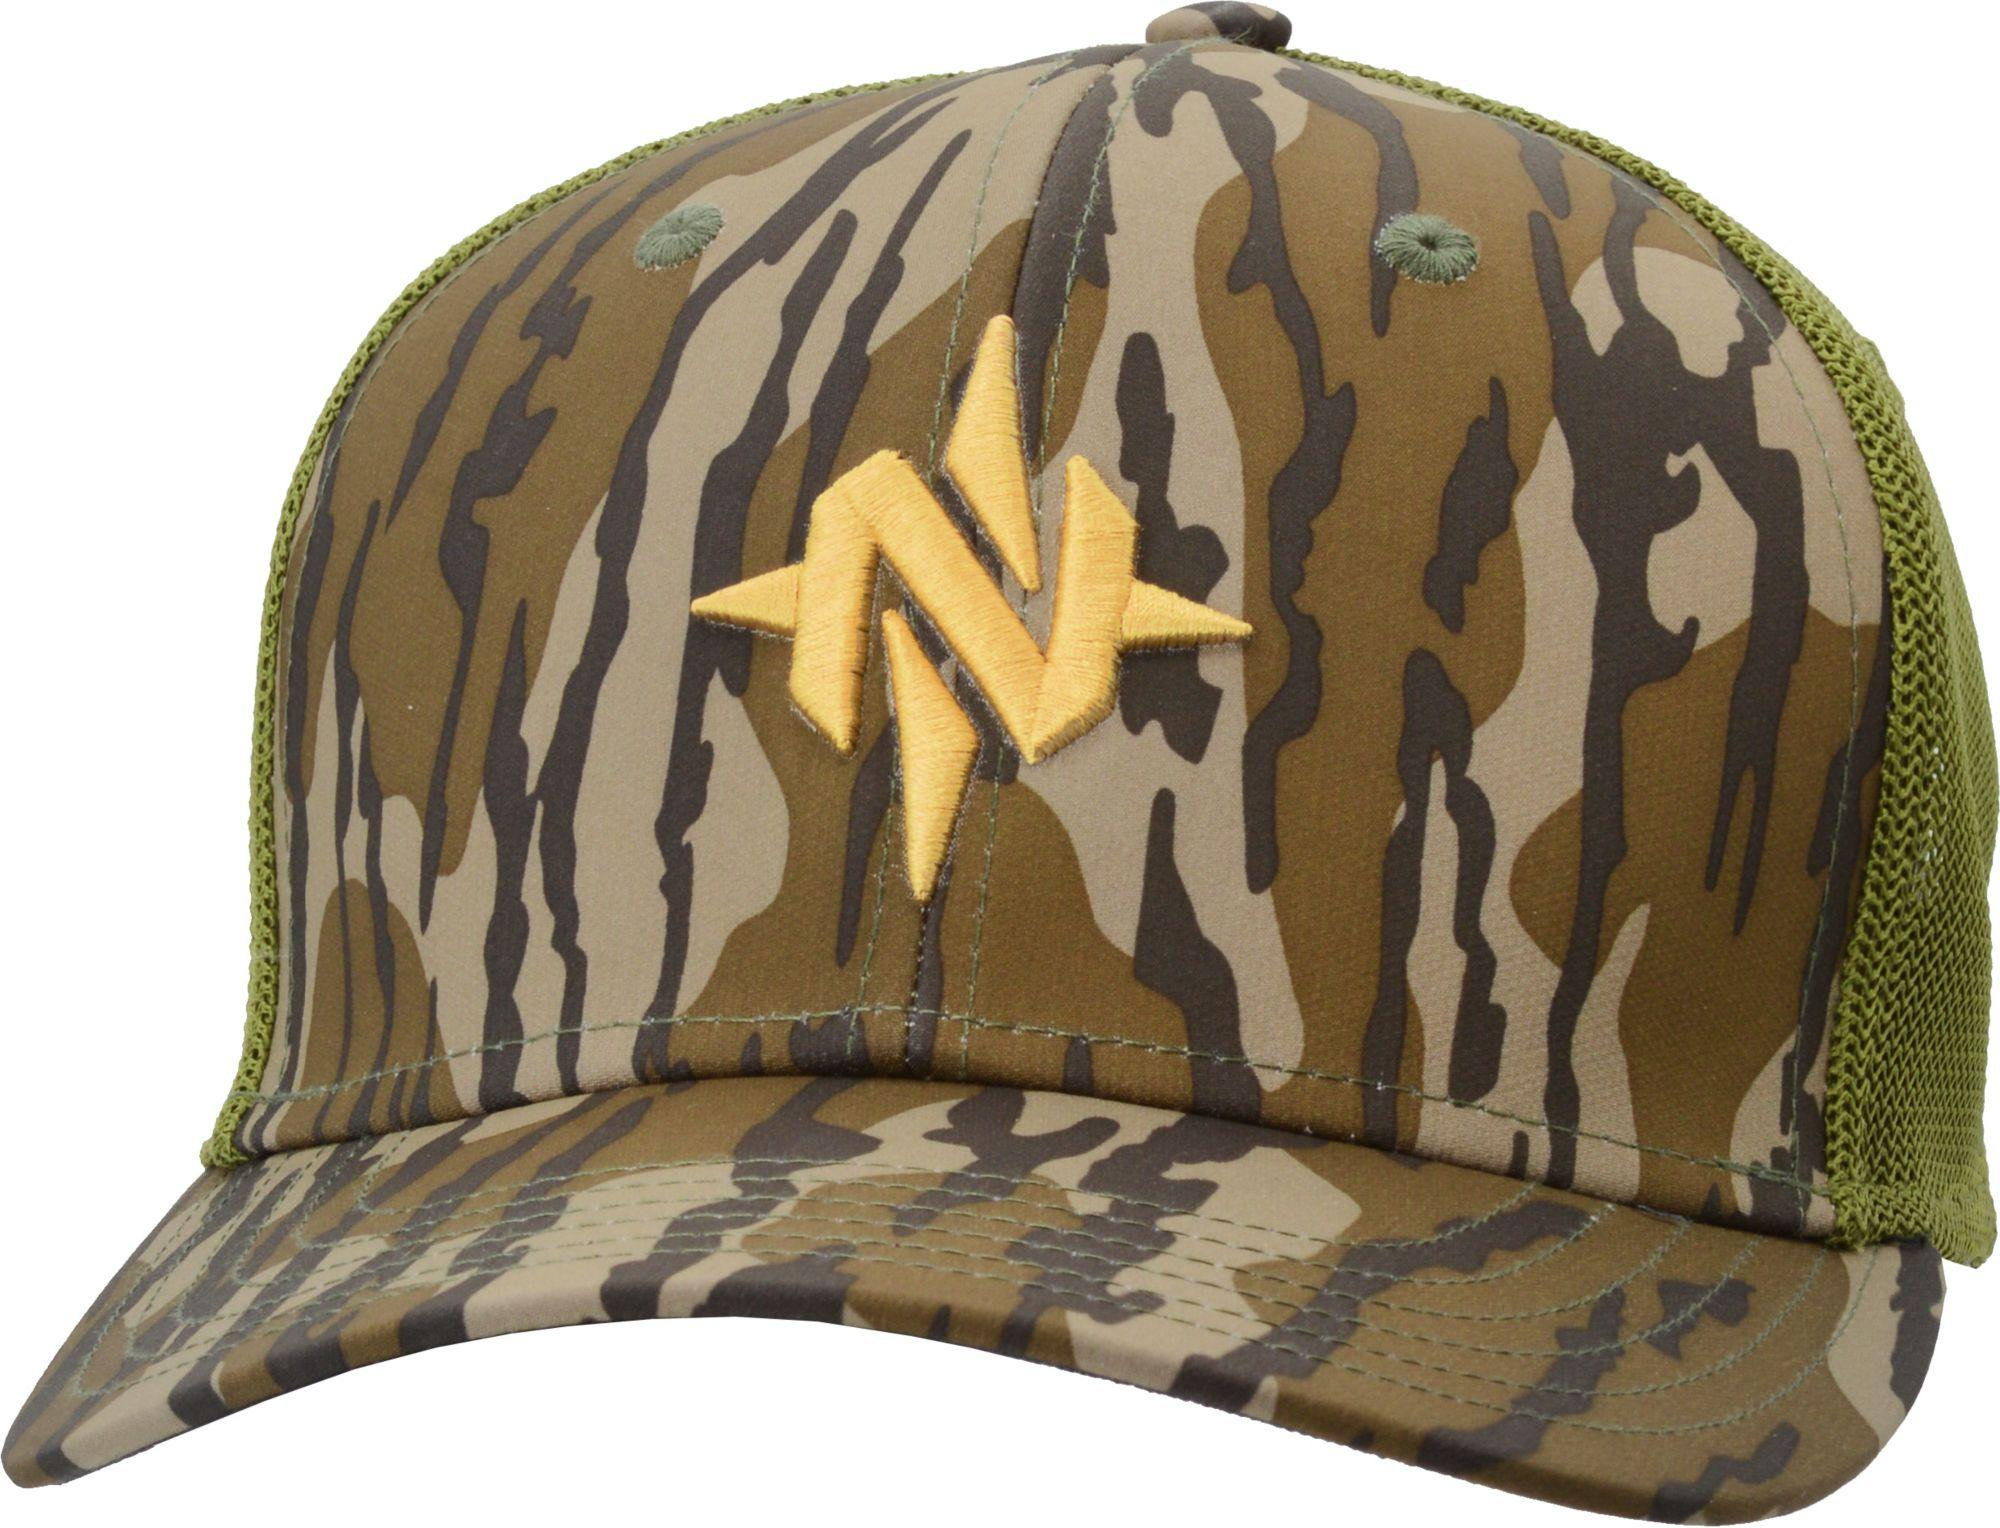 8ada2336896d Nomad Mark Camo Stretch Trucker Hat in Green for Men - Lyst